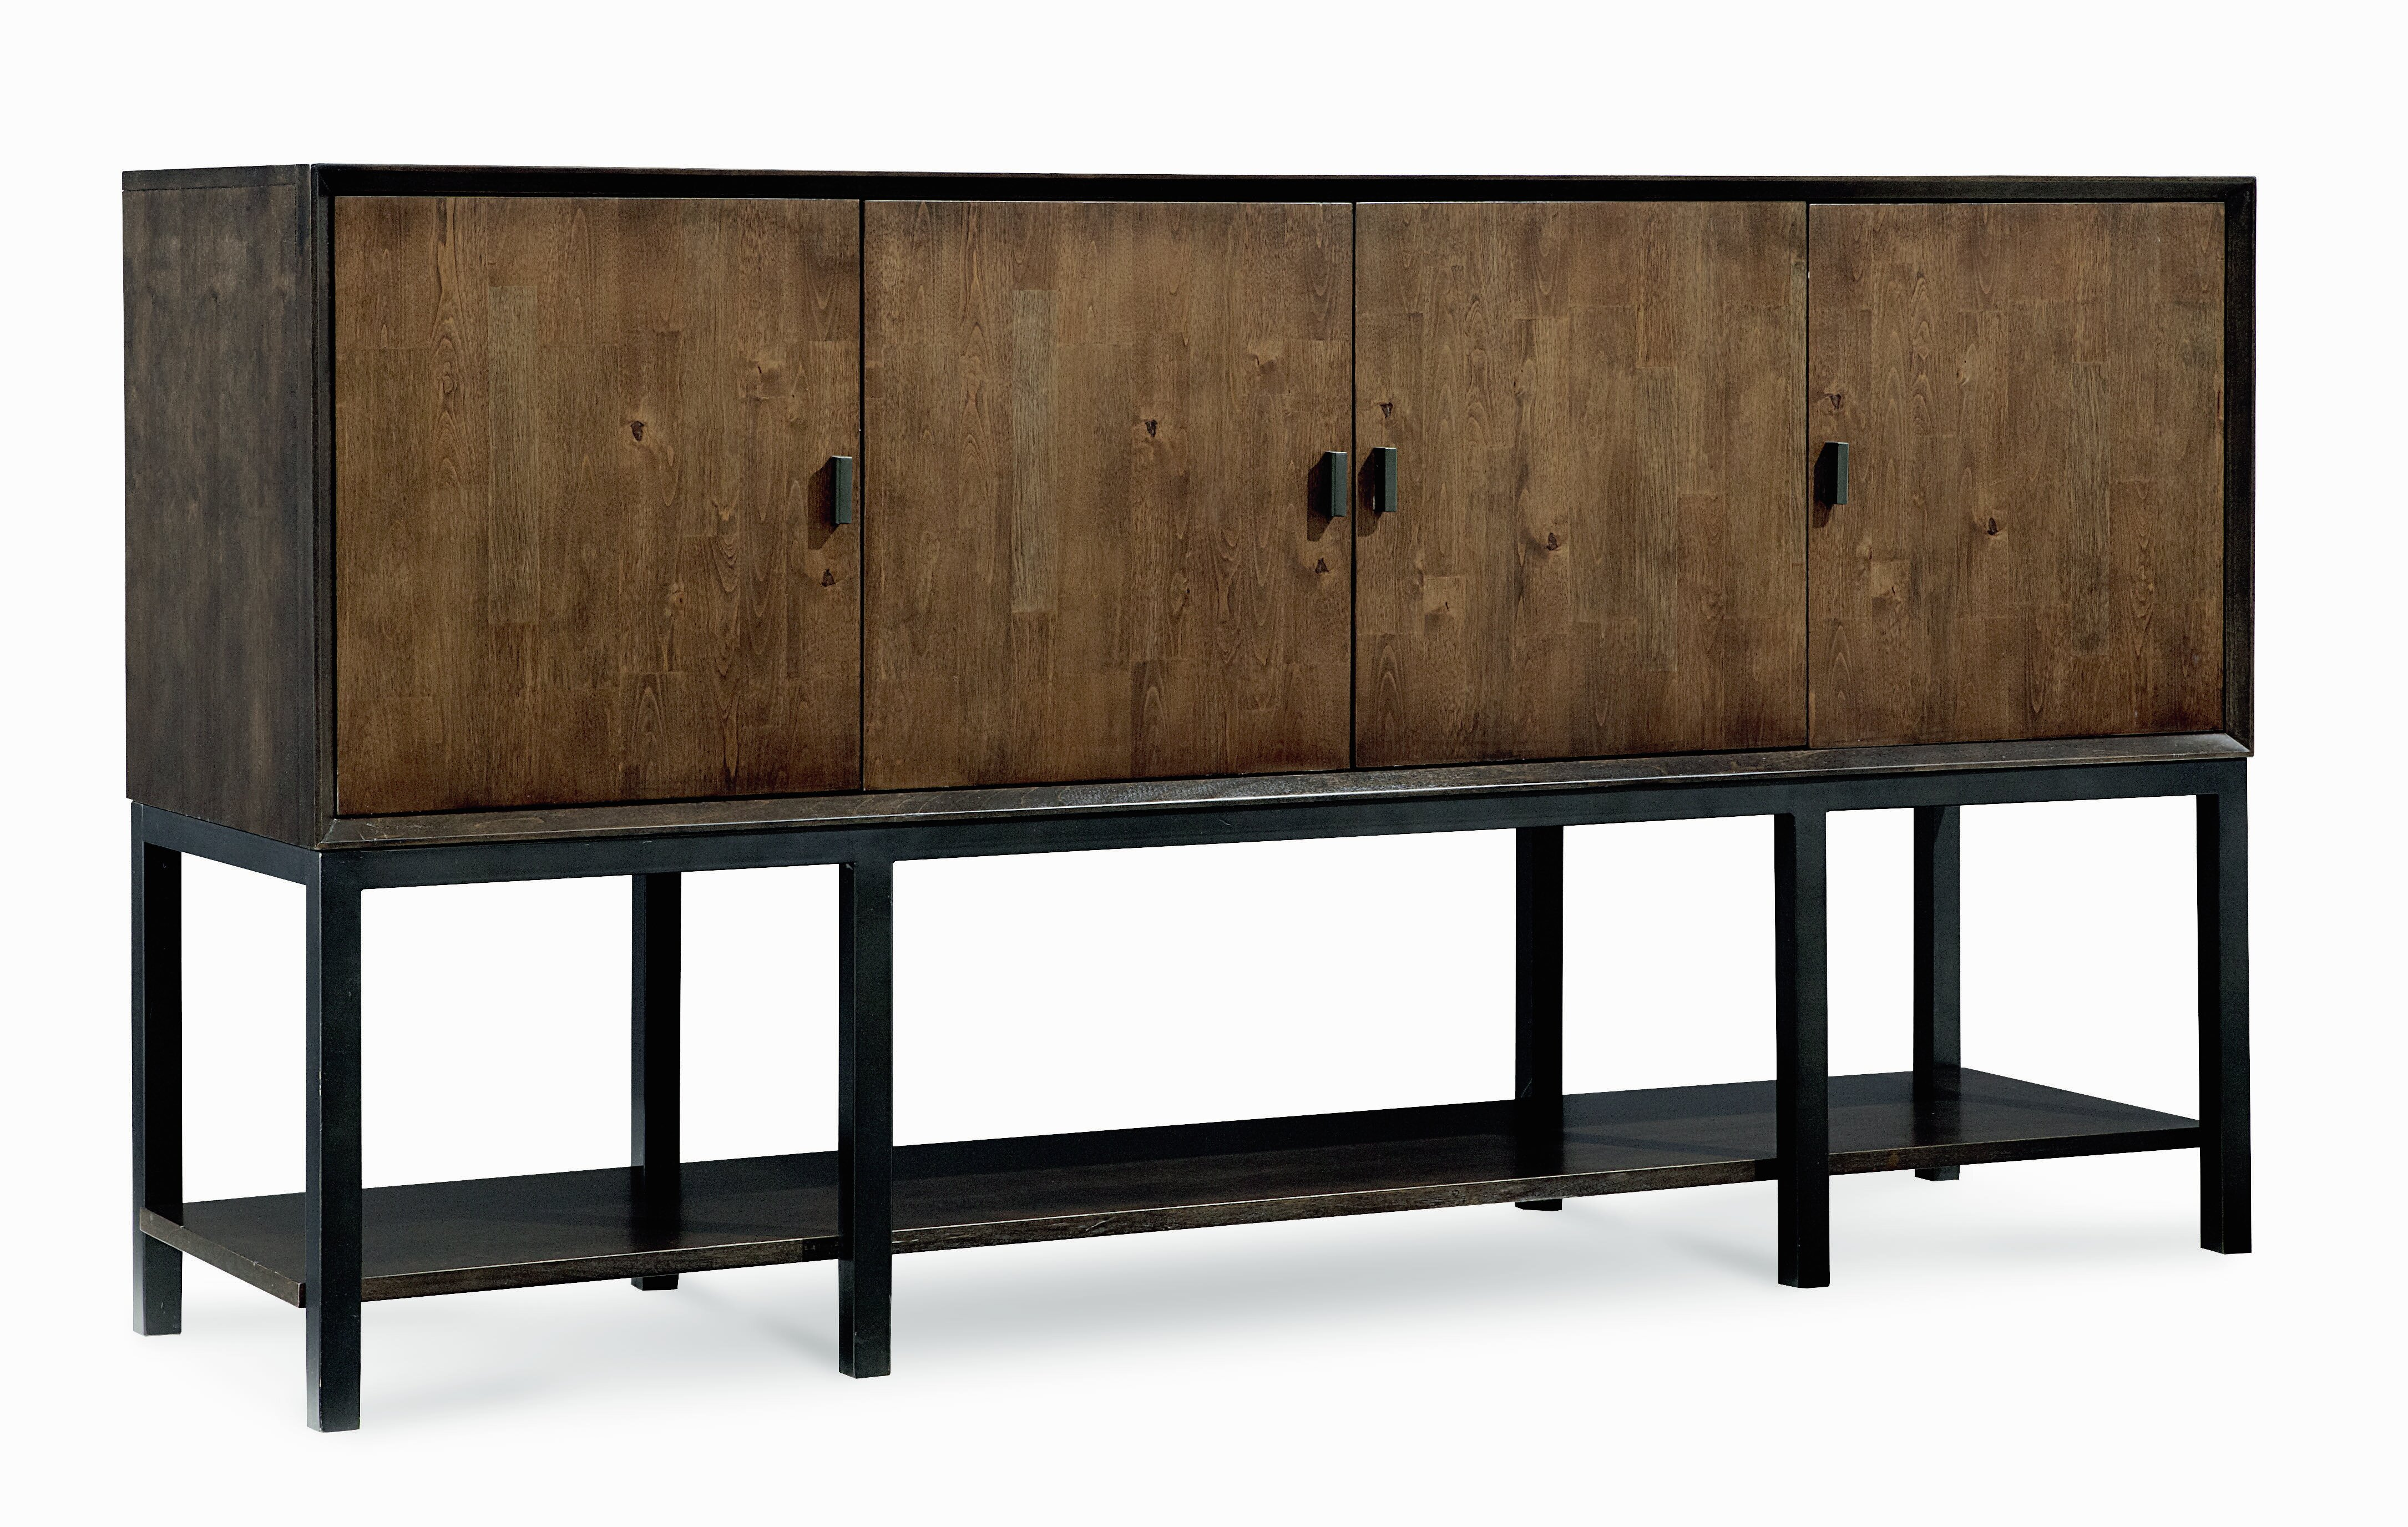 Credenza Definition Furniture : Modern & contemporary dining hutch buffet allmodern